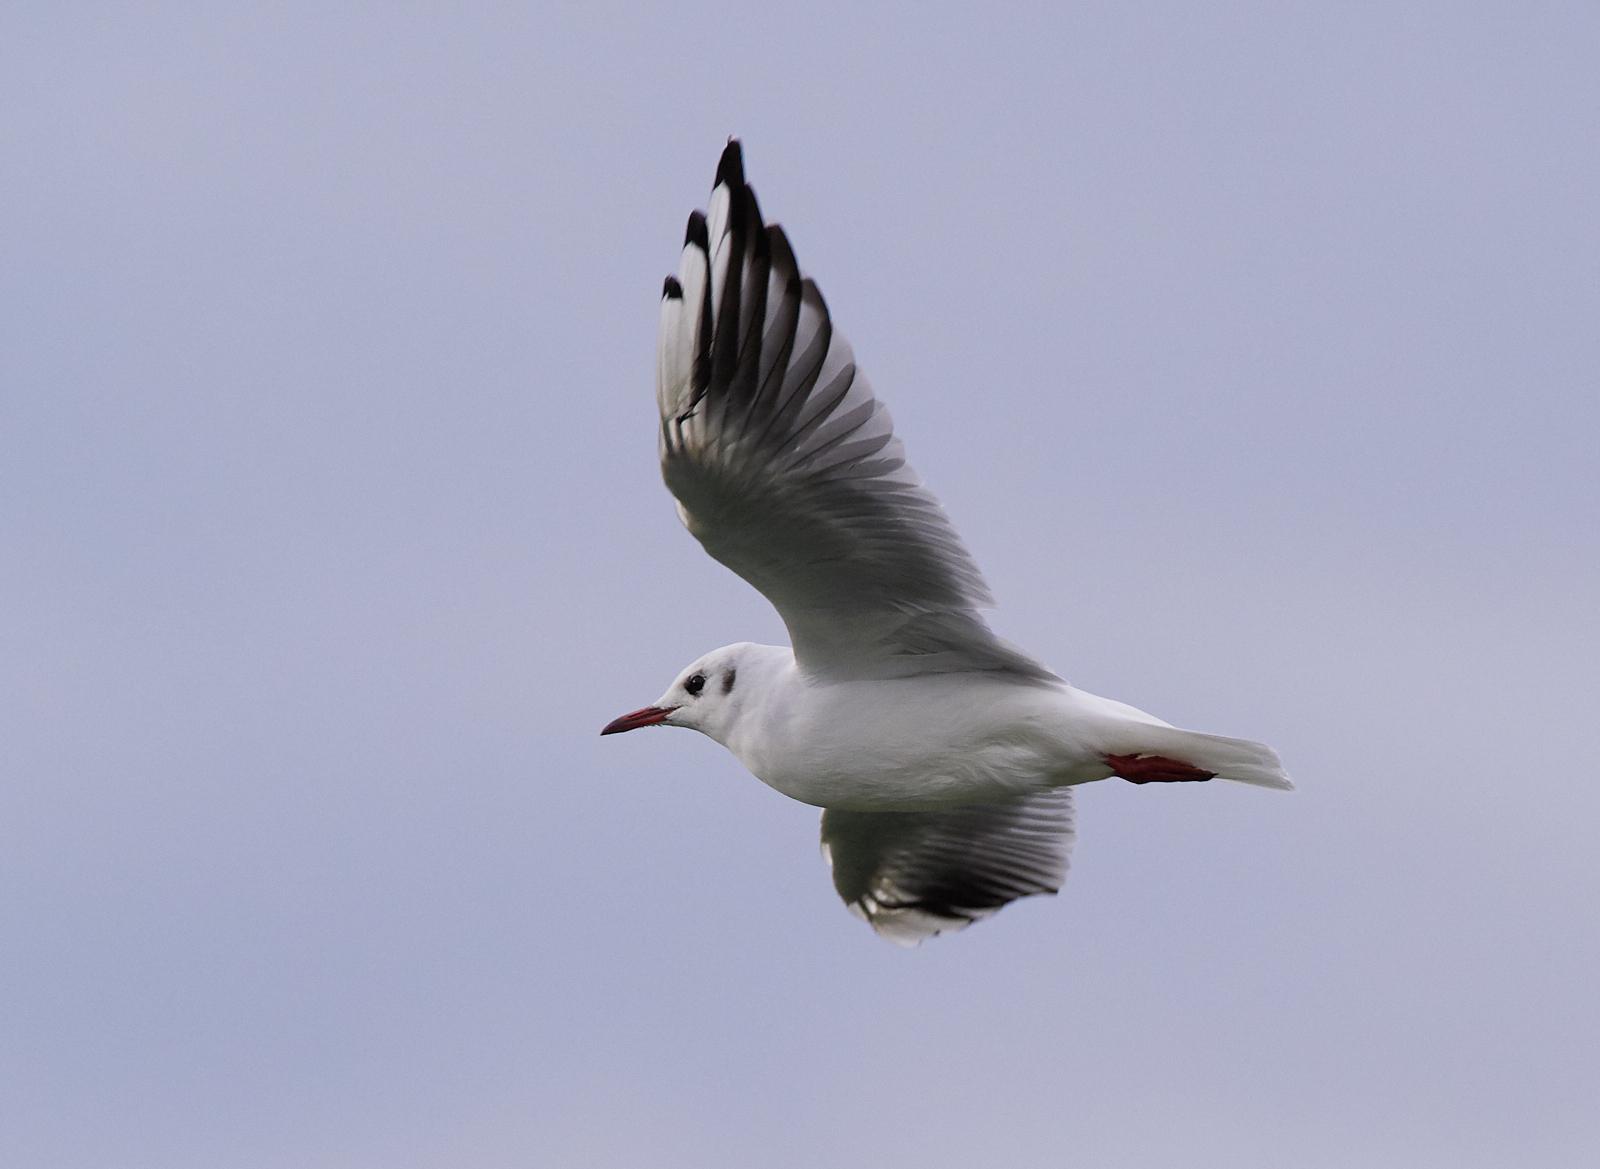 Black headed gull1600x1200 sRGB.jpg